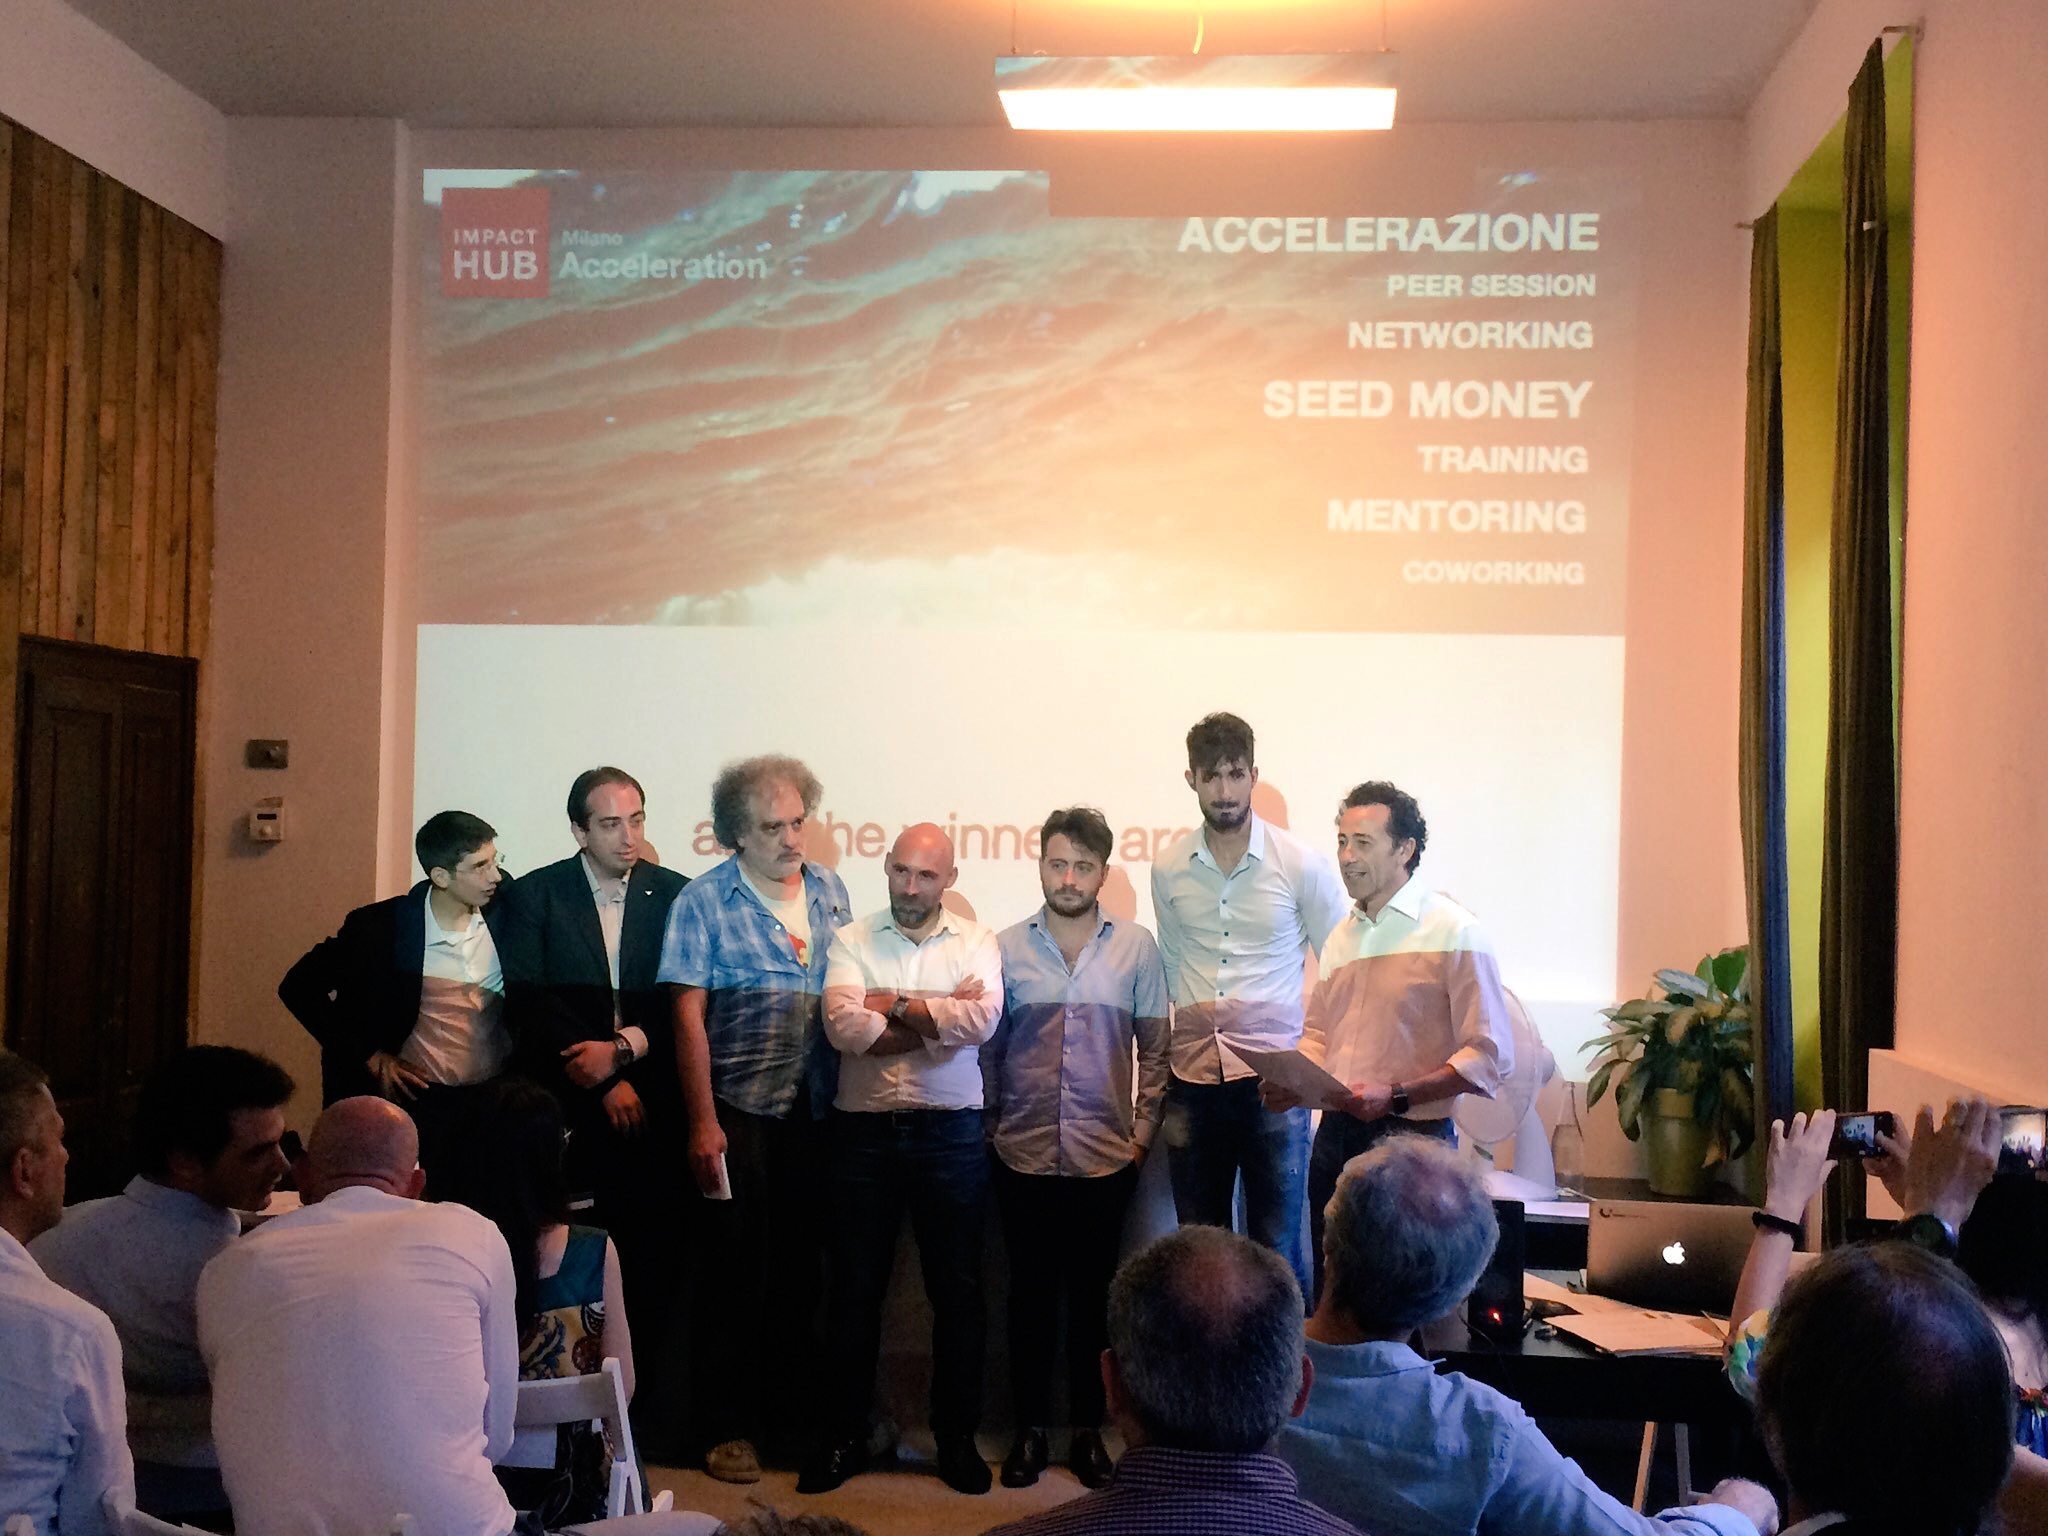 vincitori Impact Hub Acceleration